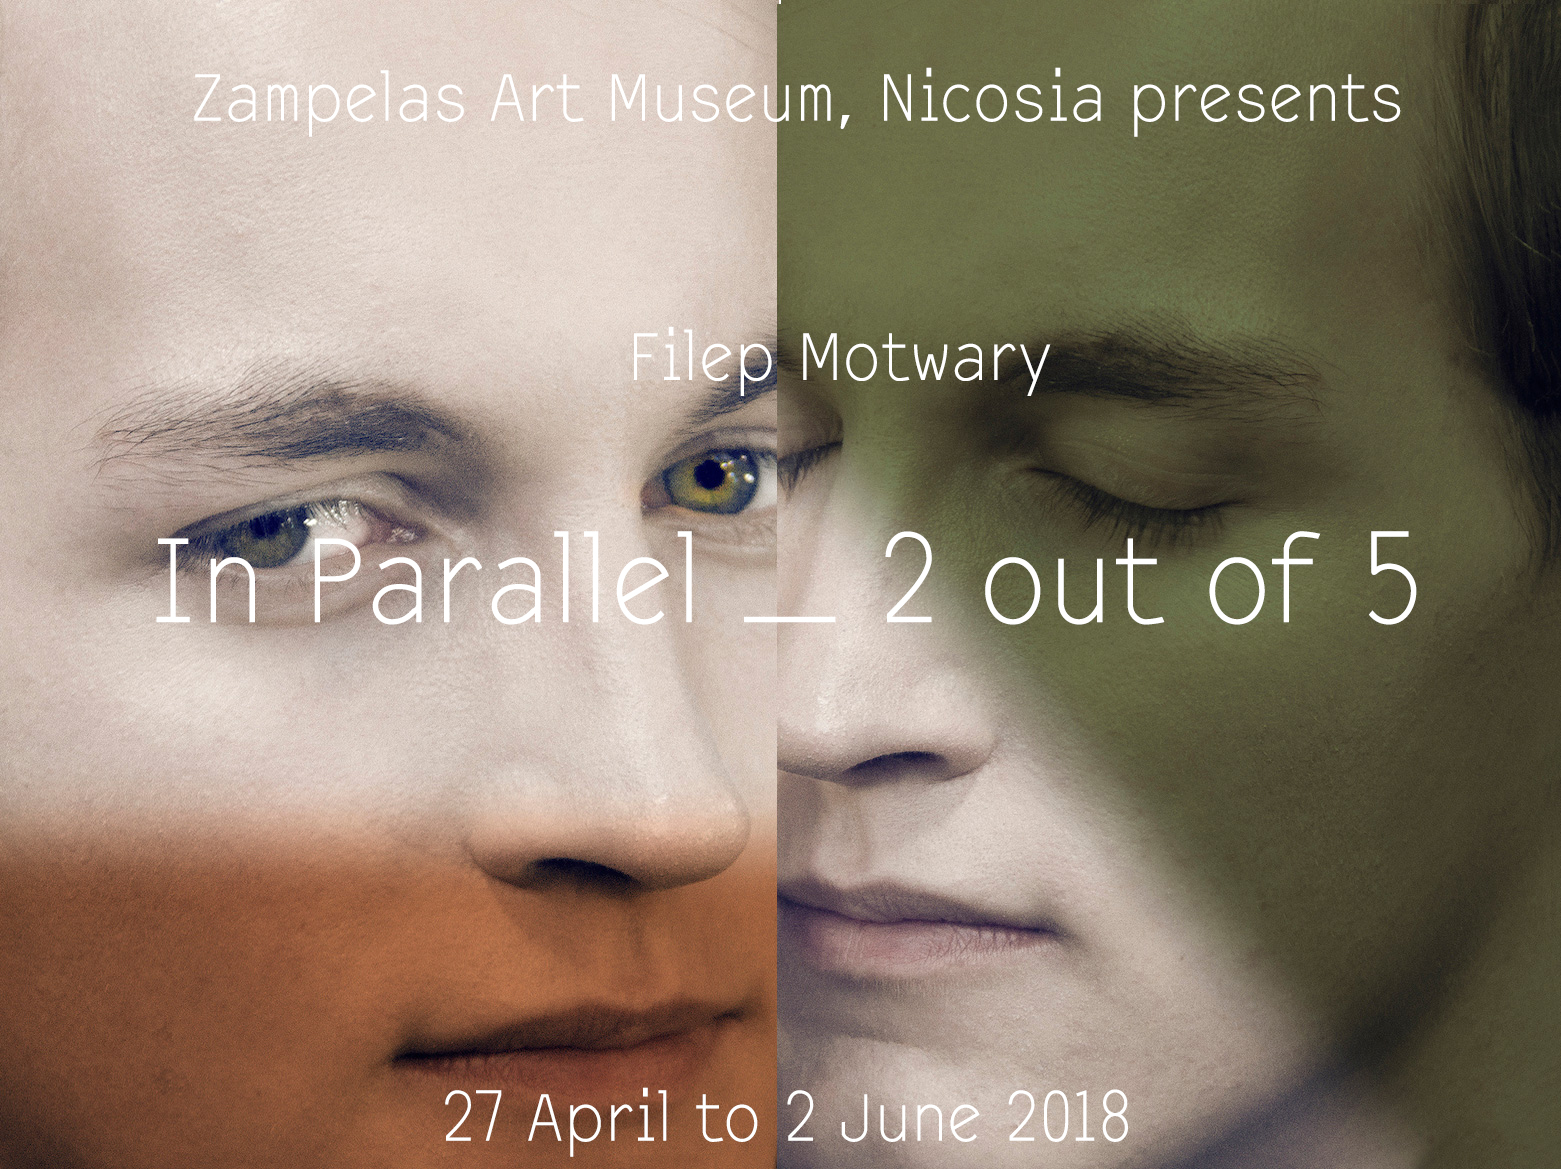 ZAMPELAS ART MUSEUM MOTWARY EXHIBITION